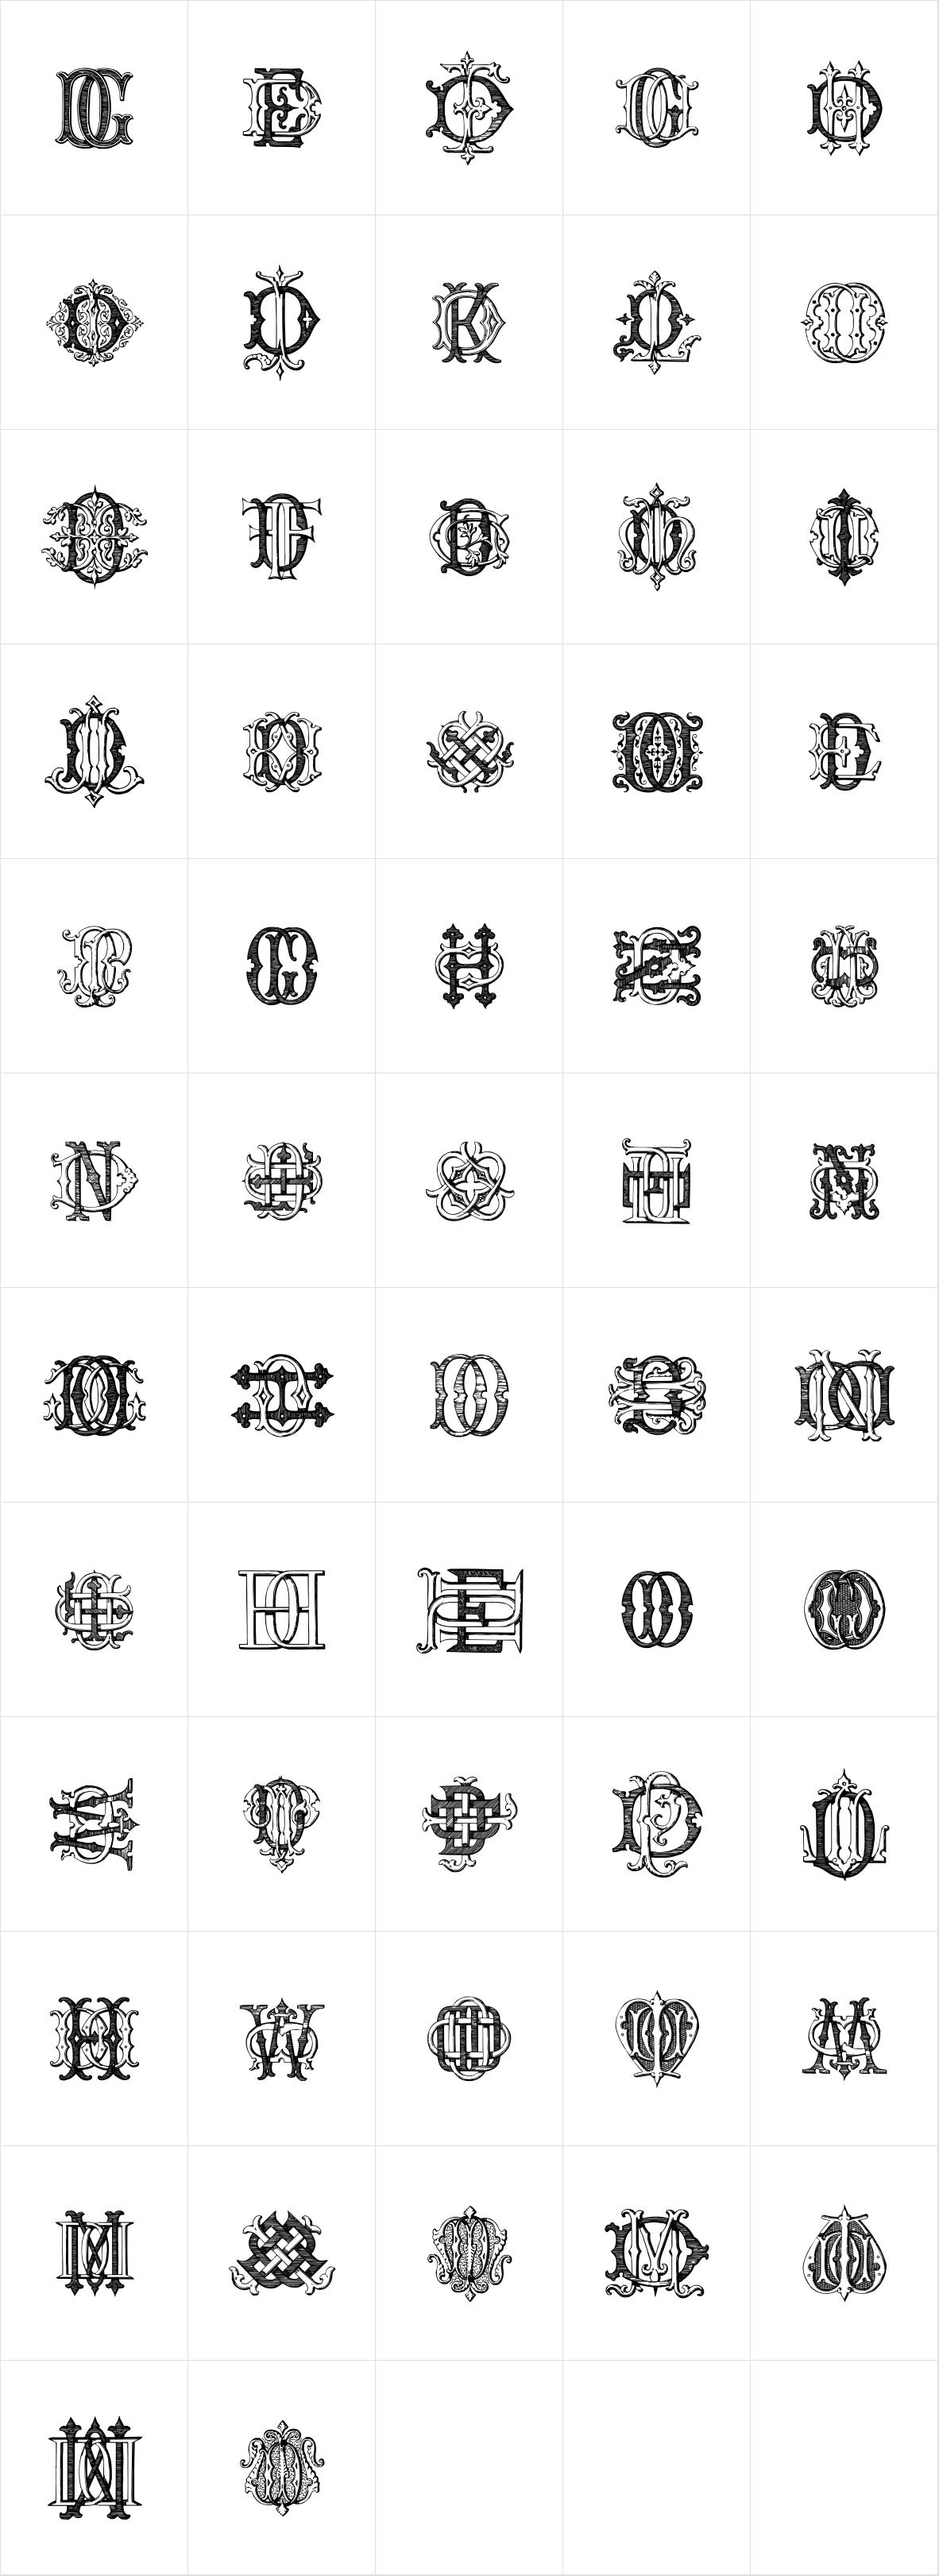 Intellecta Monograms DDDP